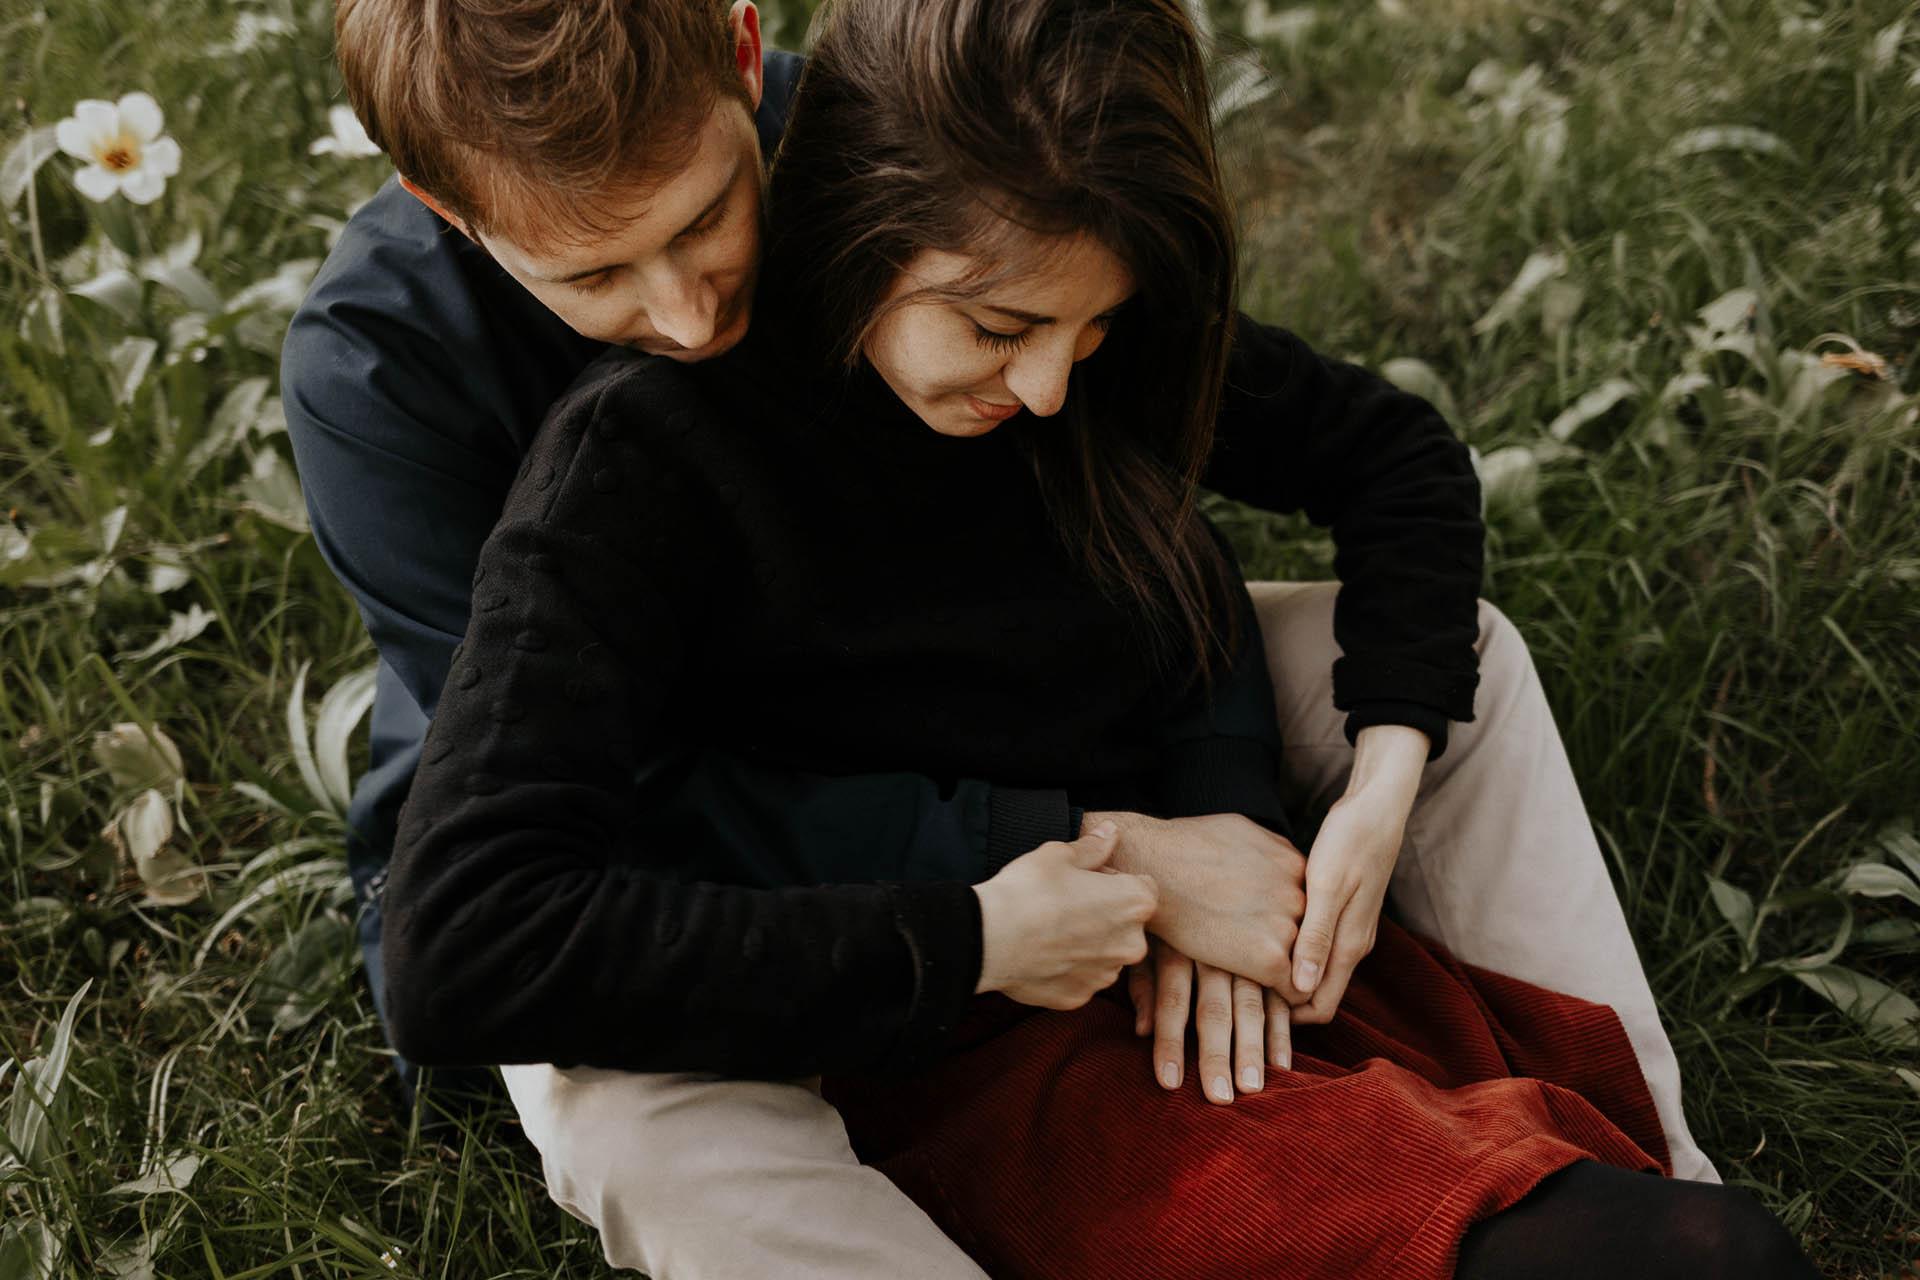 engagement_session_nantes_parc_flavie_nelly_photographe_mariage-6